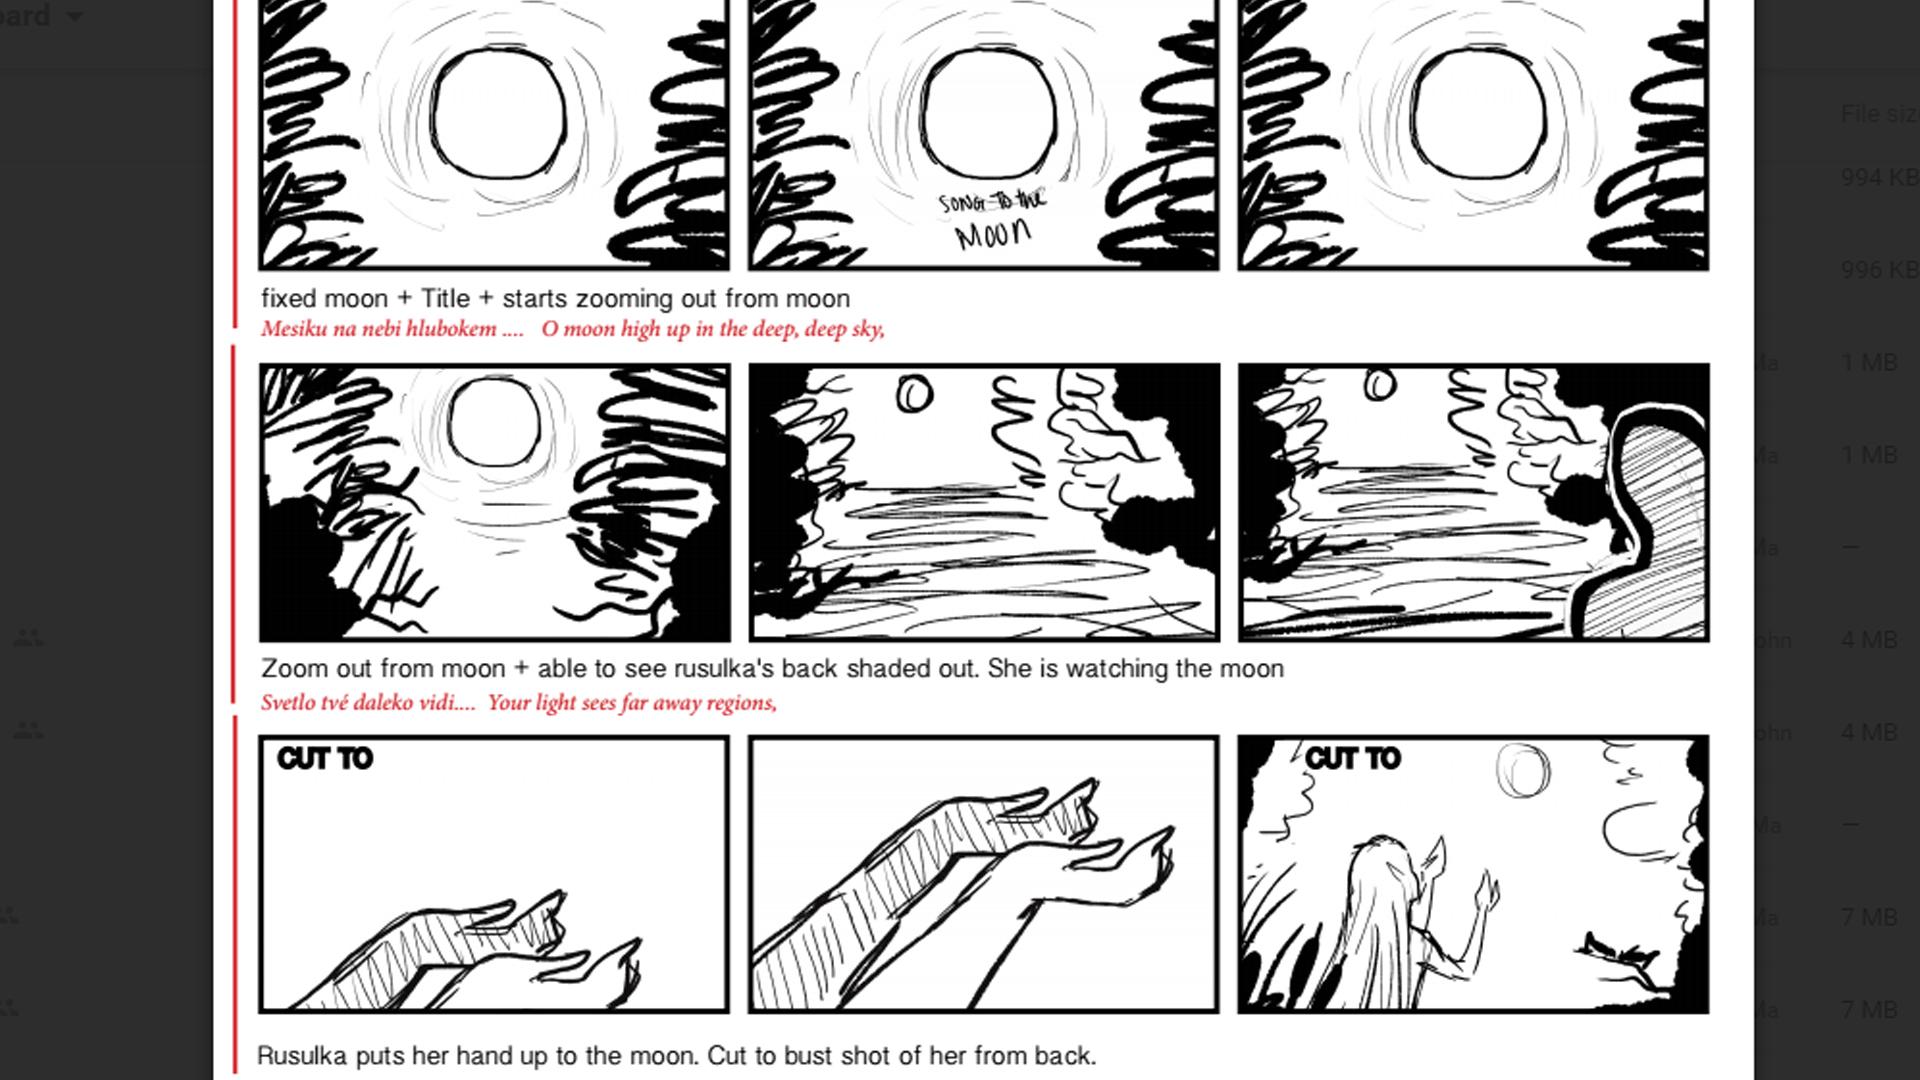 Nivetha's Storyboard